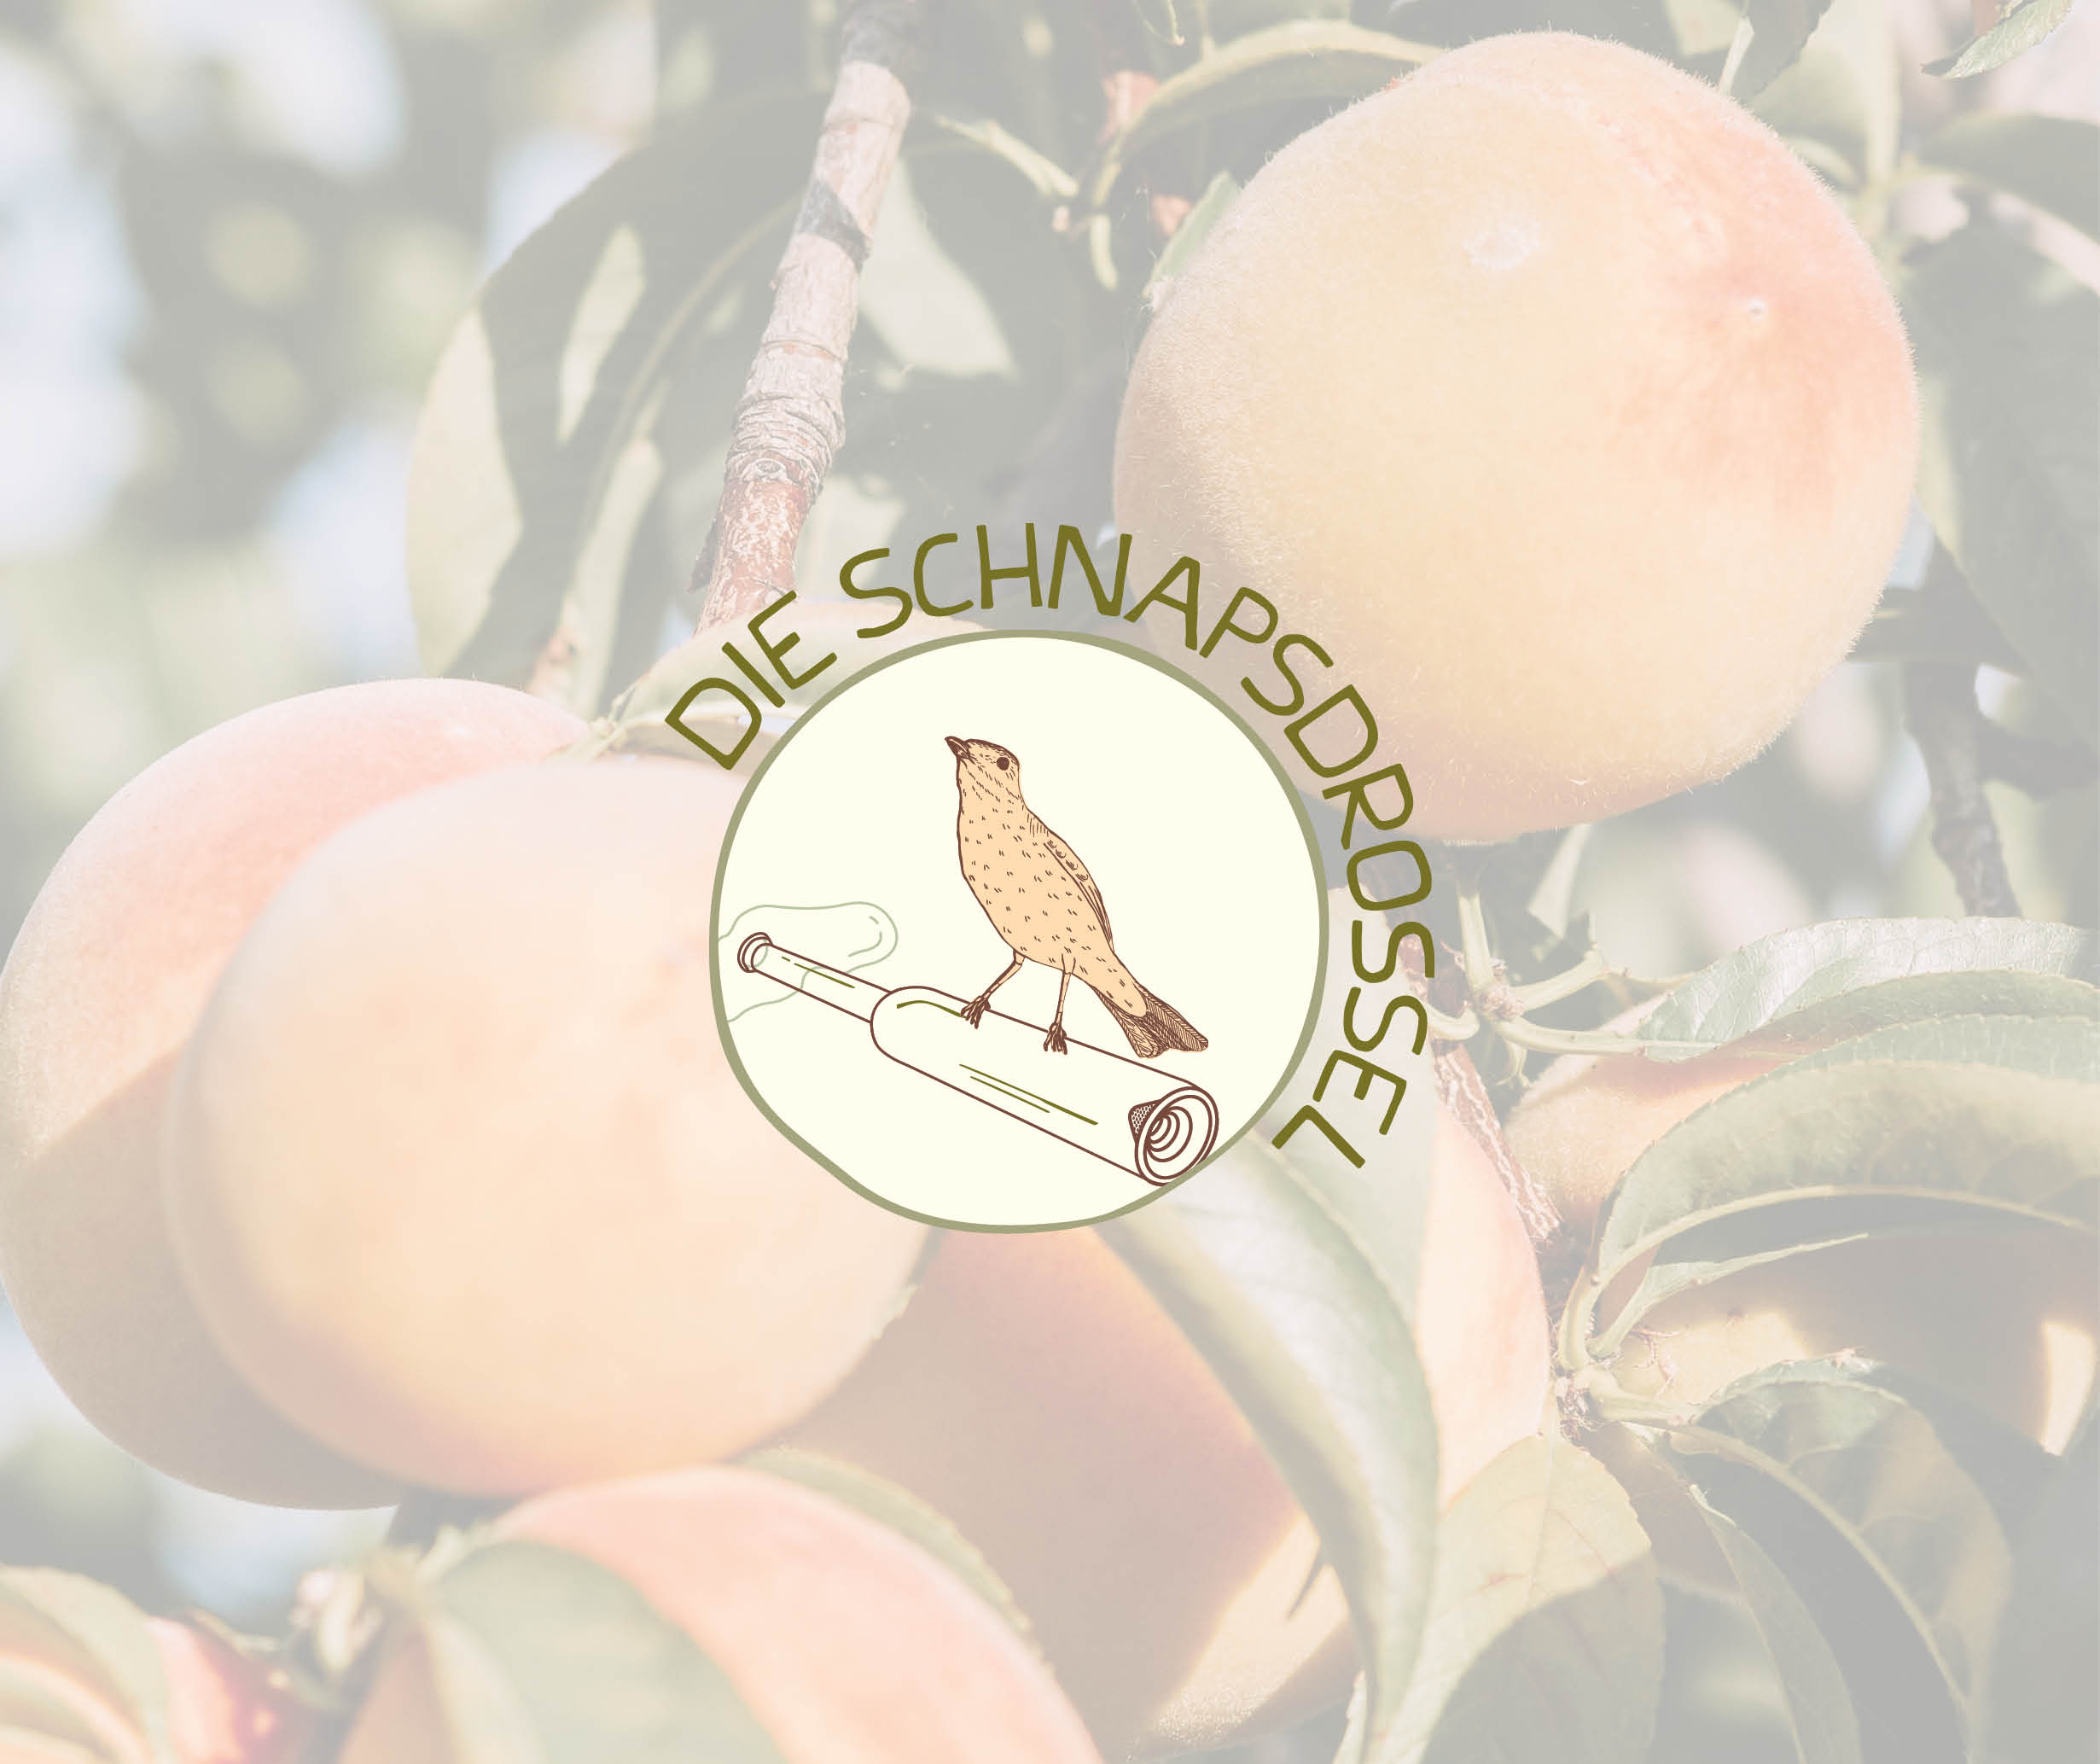 Schnapsdrossel brand identity - logo - by Magdalena Weiss